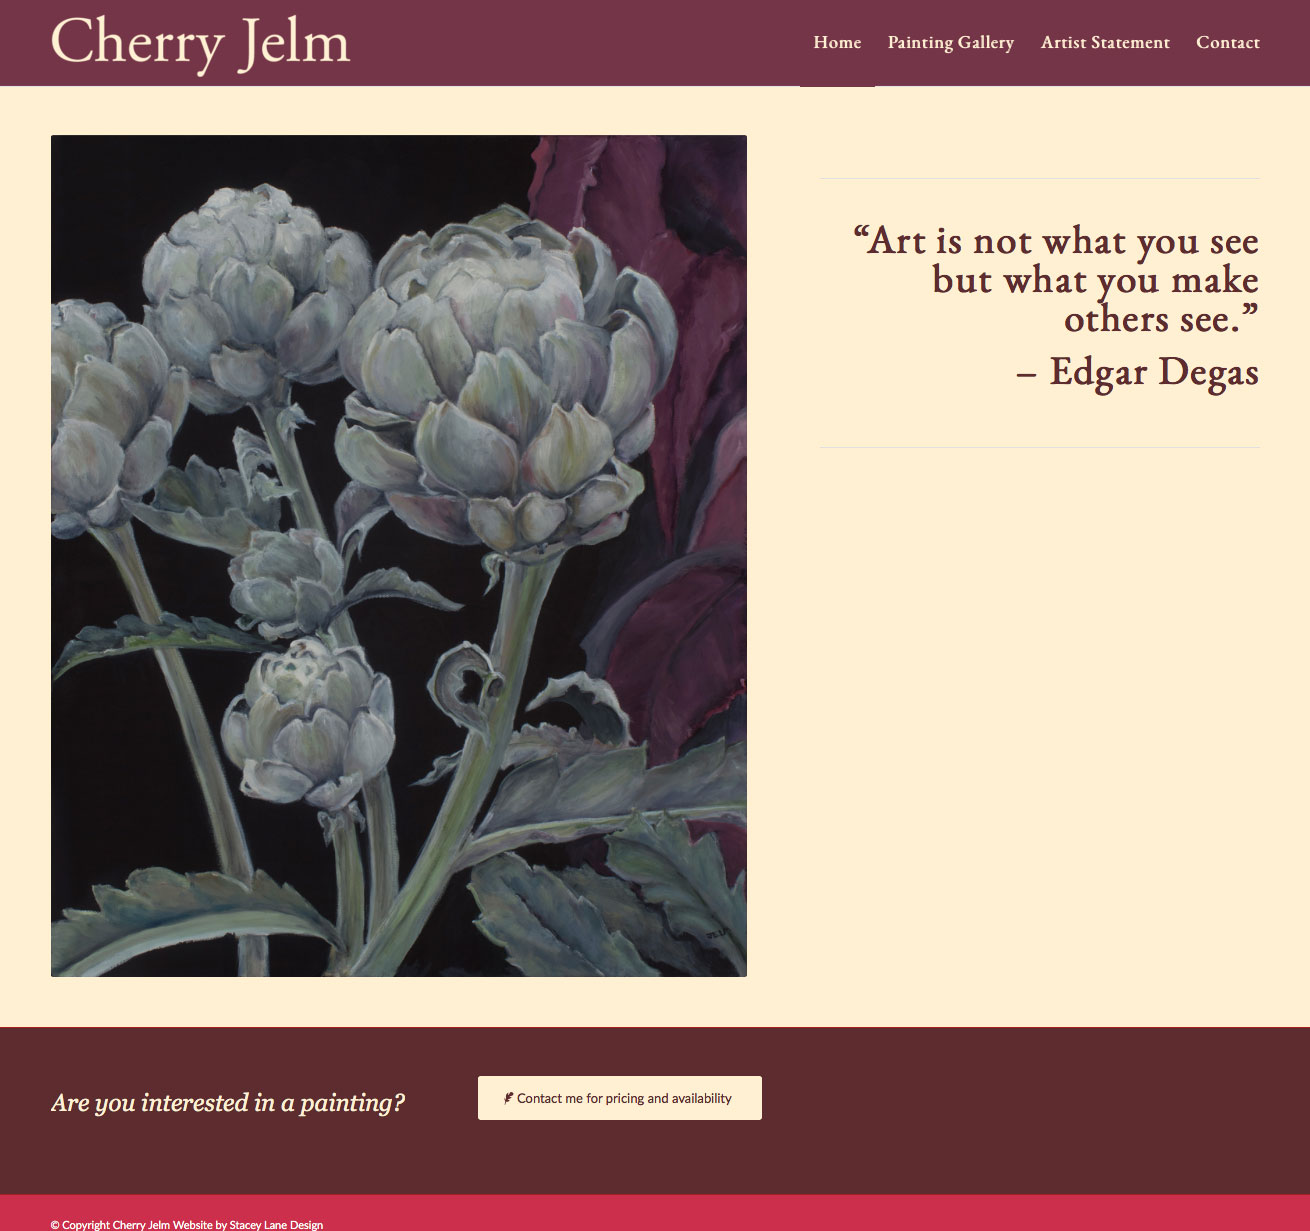 Cherry Jelm website design